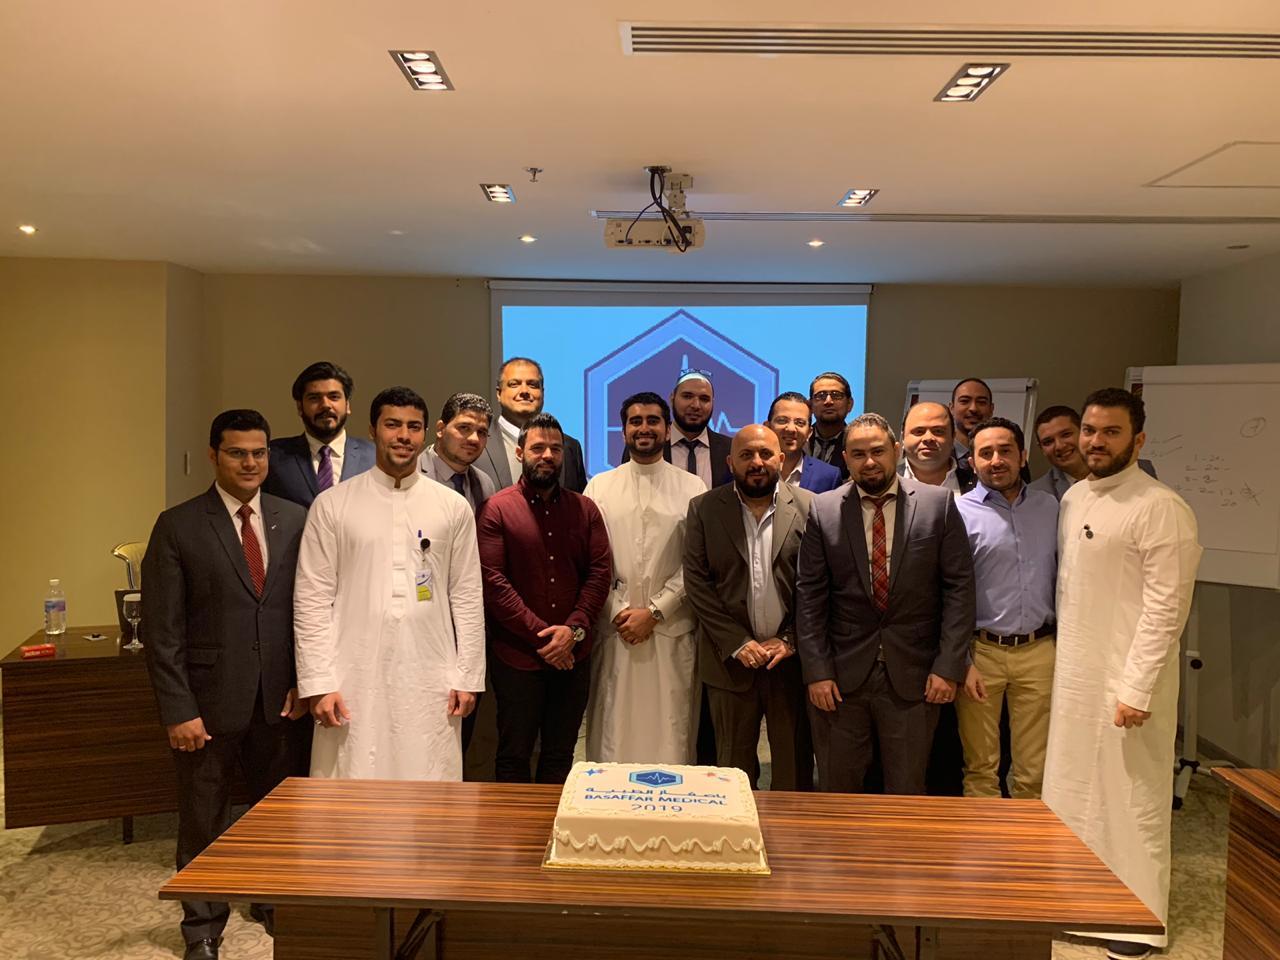 BME 2019 kick-start meeting 2